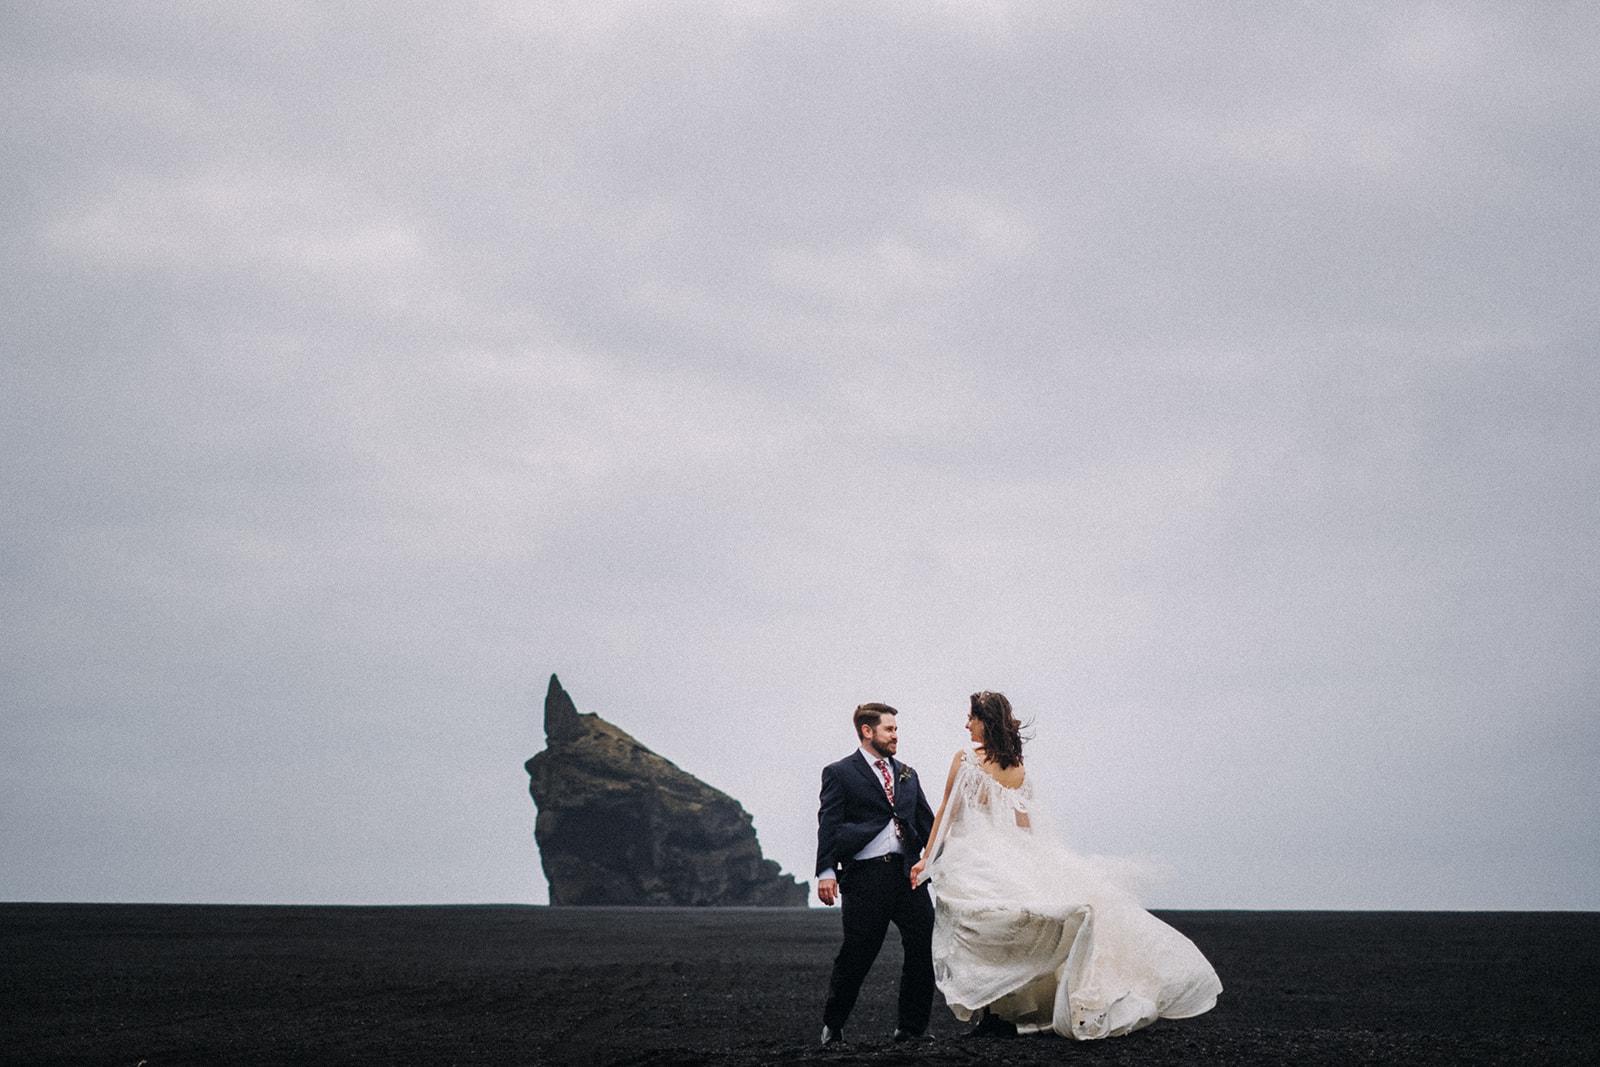 Get-married-in-iceland-pink-iceland-wedd